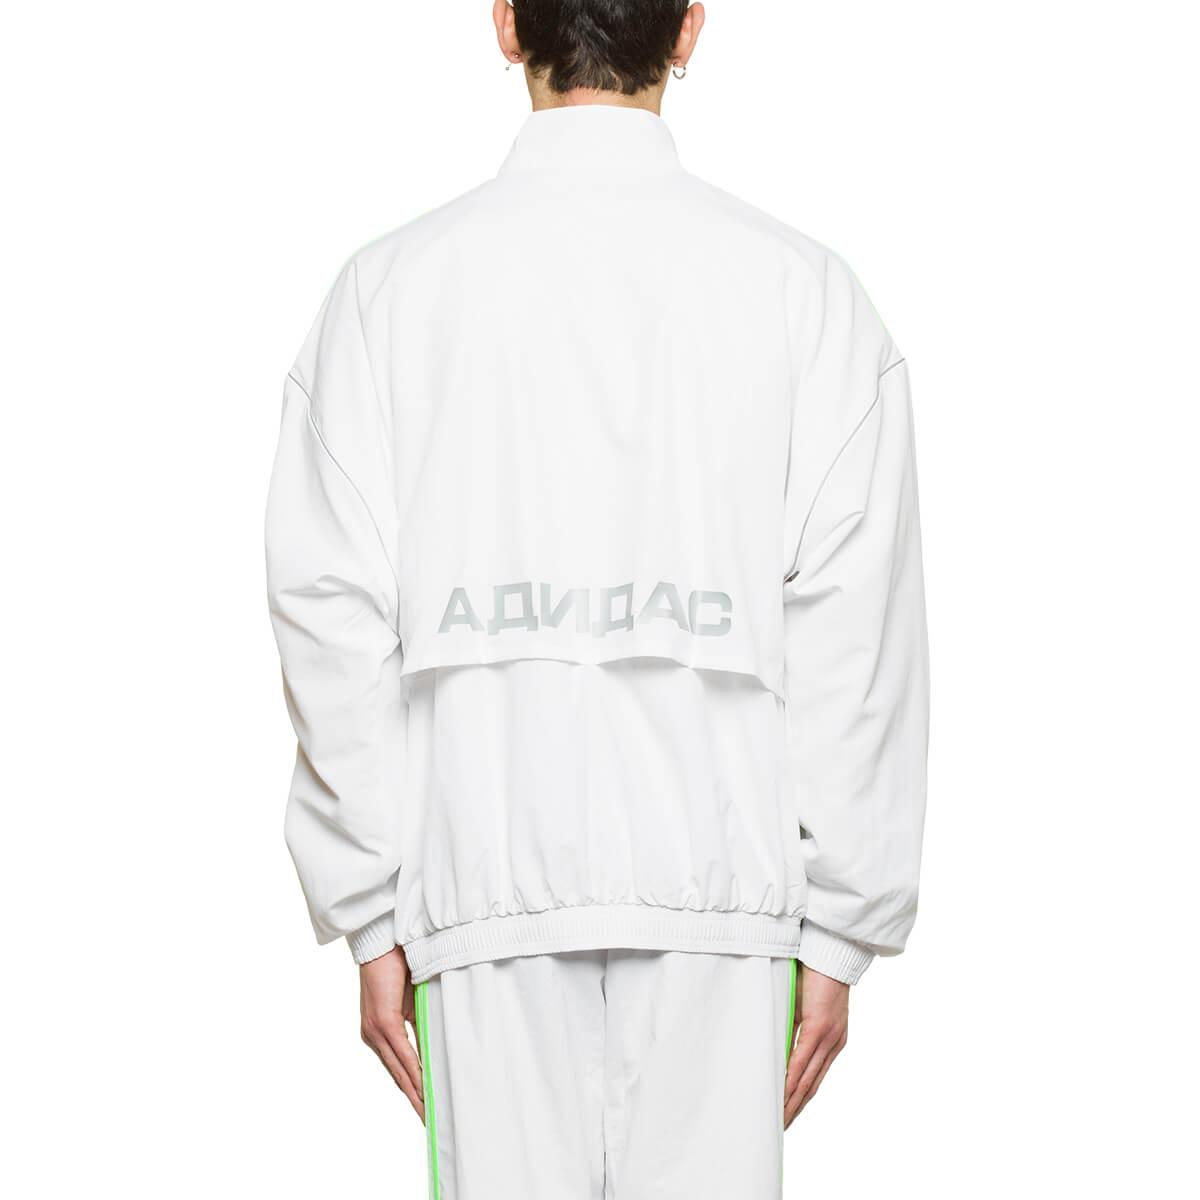 4f05e3a3 Lyst - Gosha Rubchinskiy Adidas Track-top in White for Men